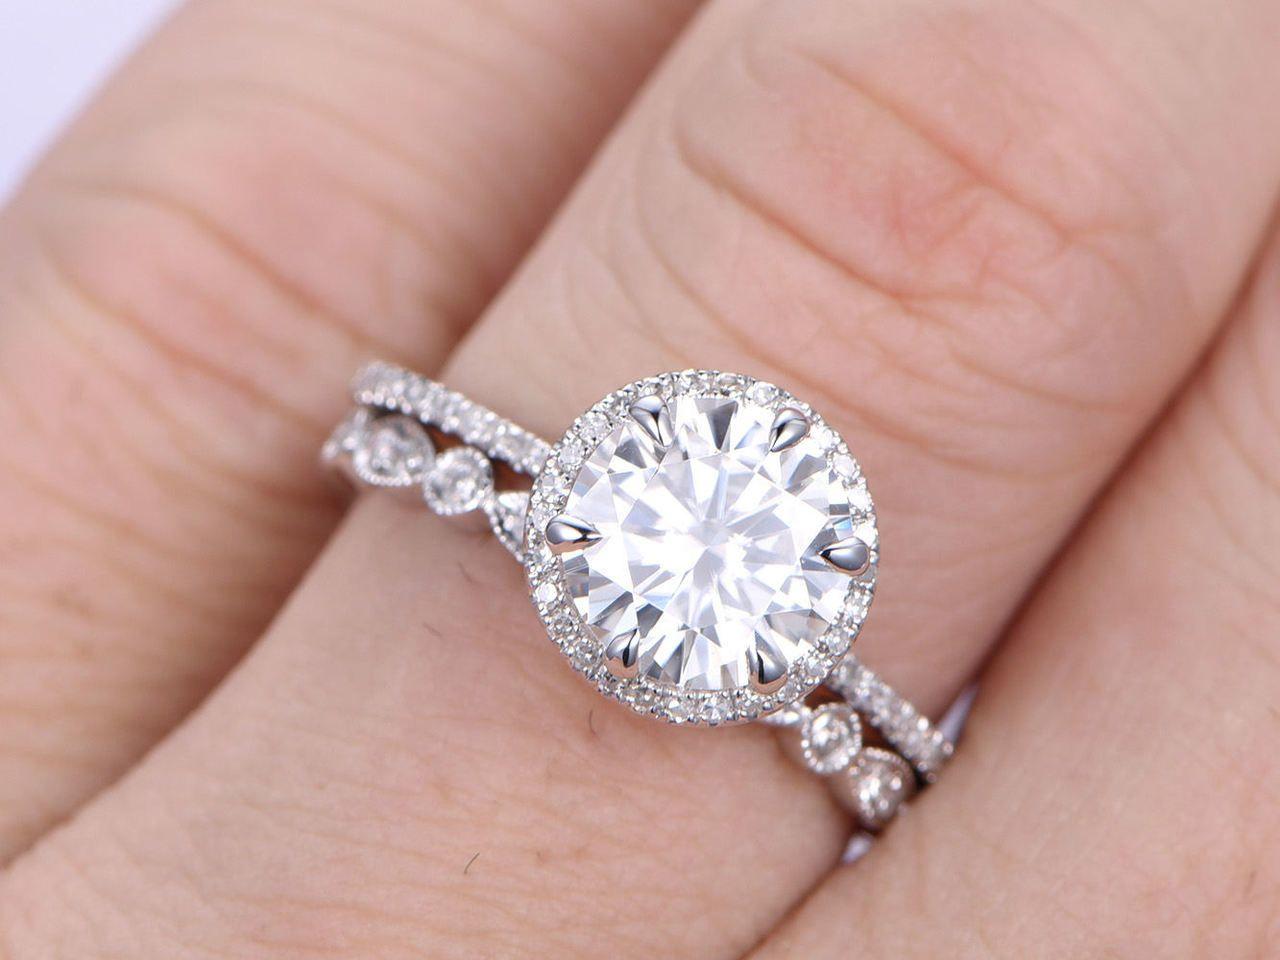 Pcs wedding rng setbig moissanite ringmm round cut moissanite